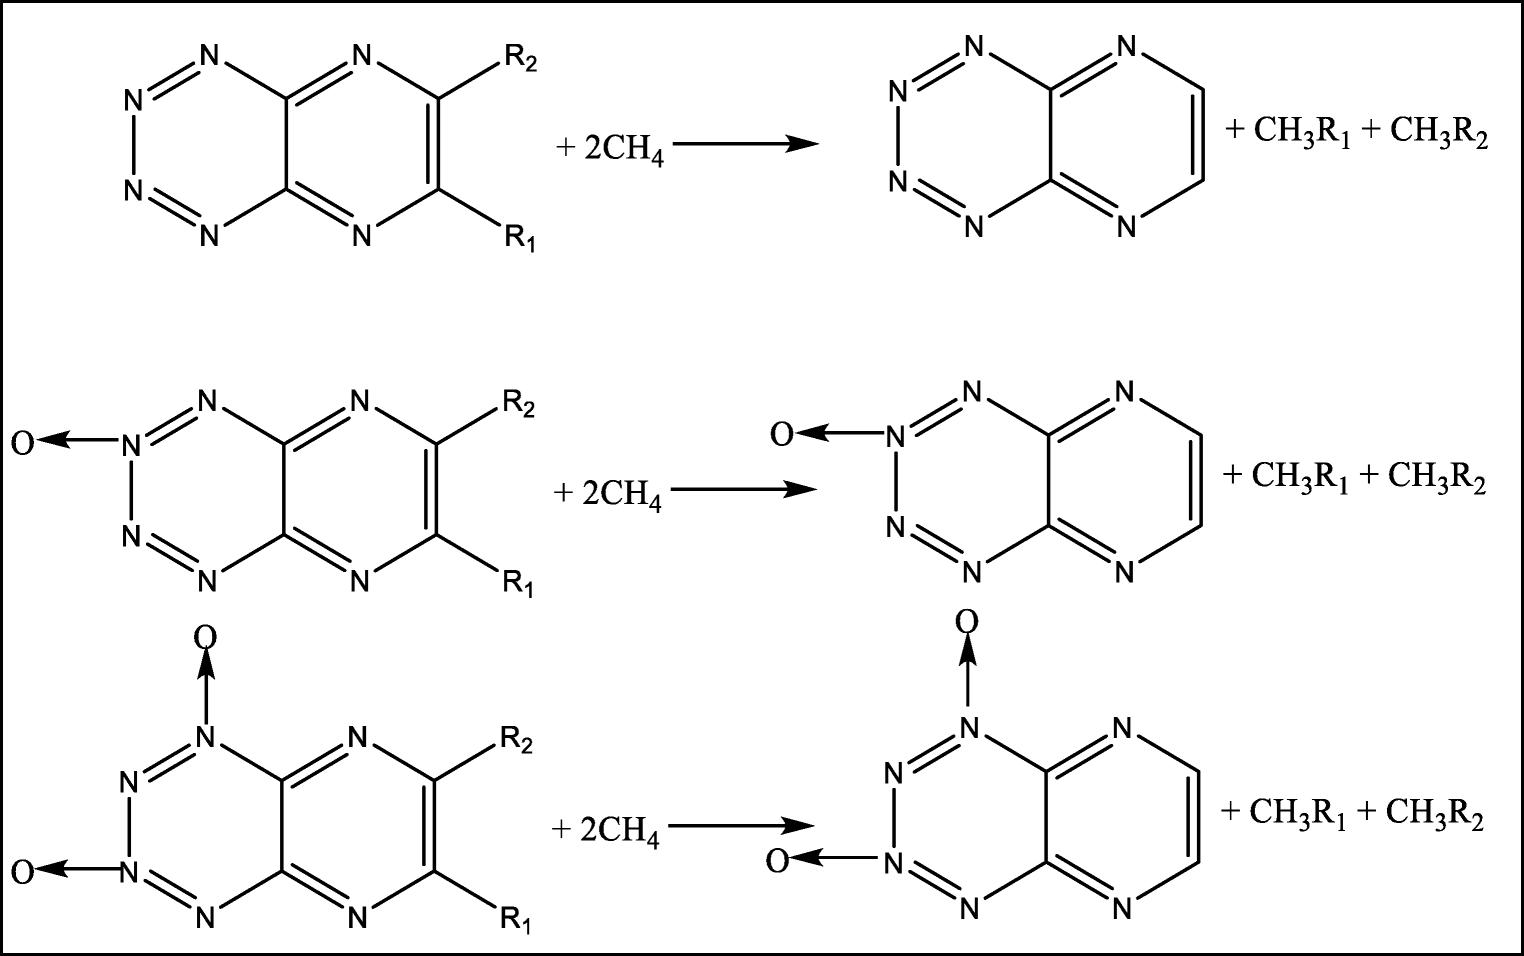 DFT studies on nitrogen-rich pyrazino [2, 3-e] [1, 2, 3, 4